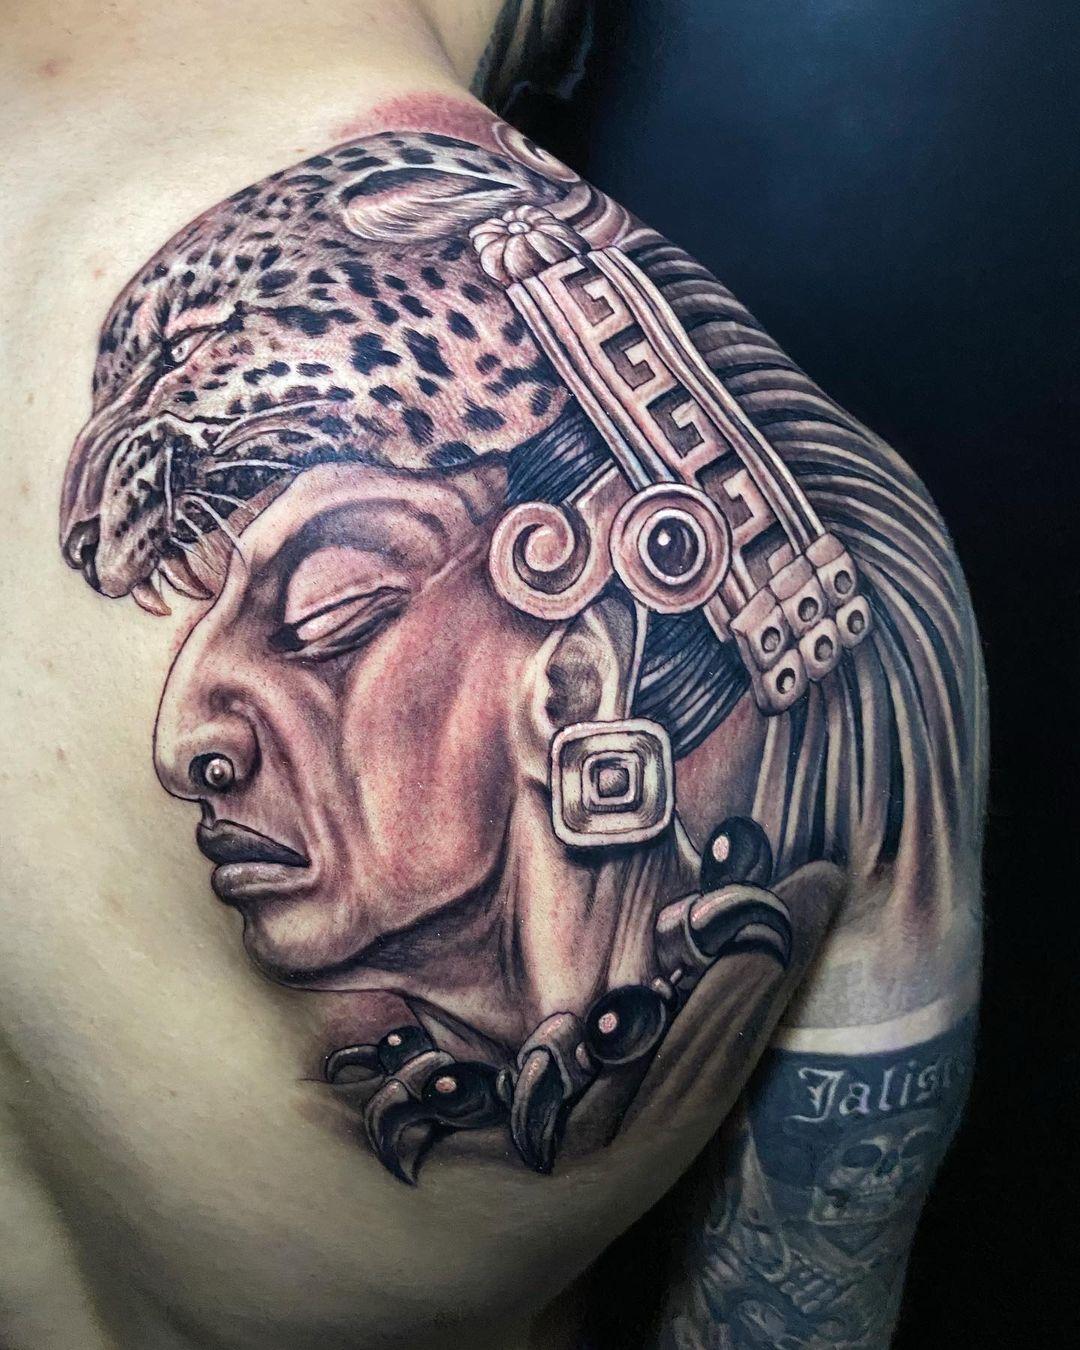 Image of magestic Mayan tattoo